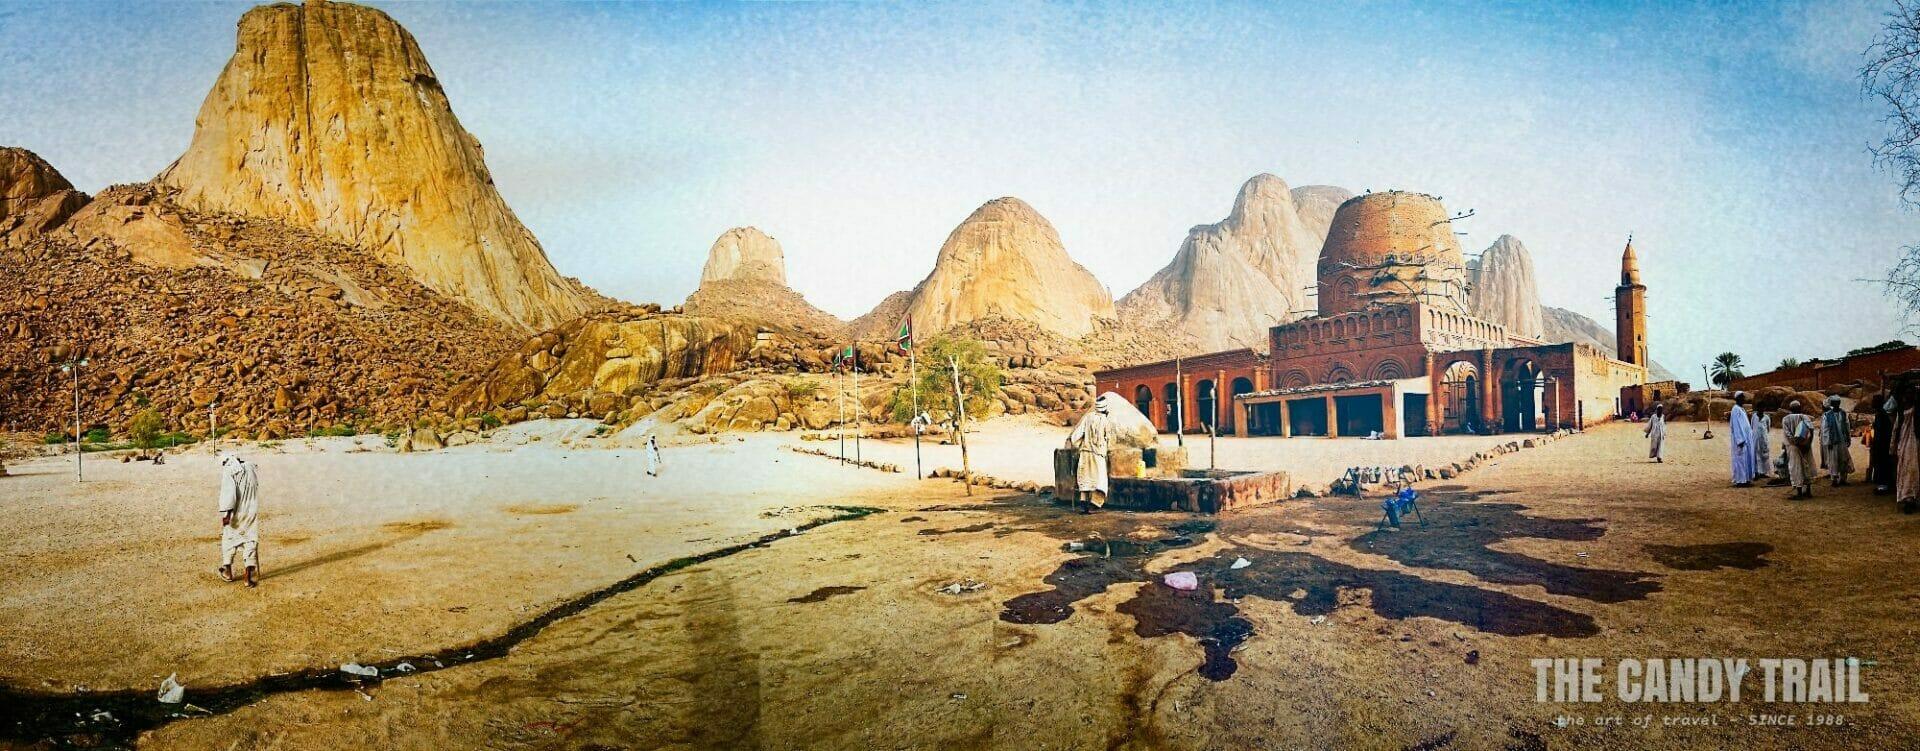 taka mountains mosque kassala sudan